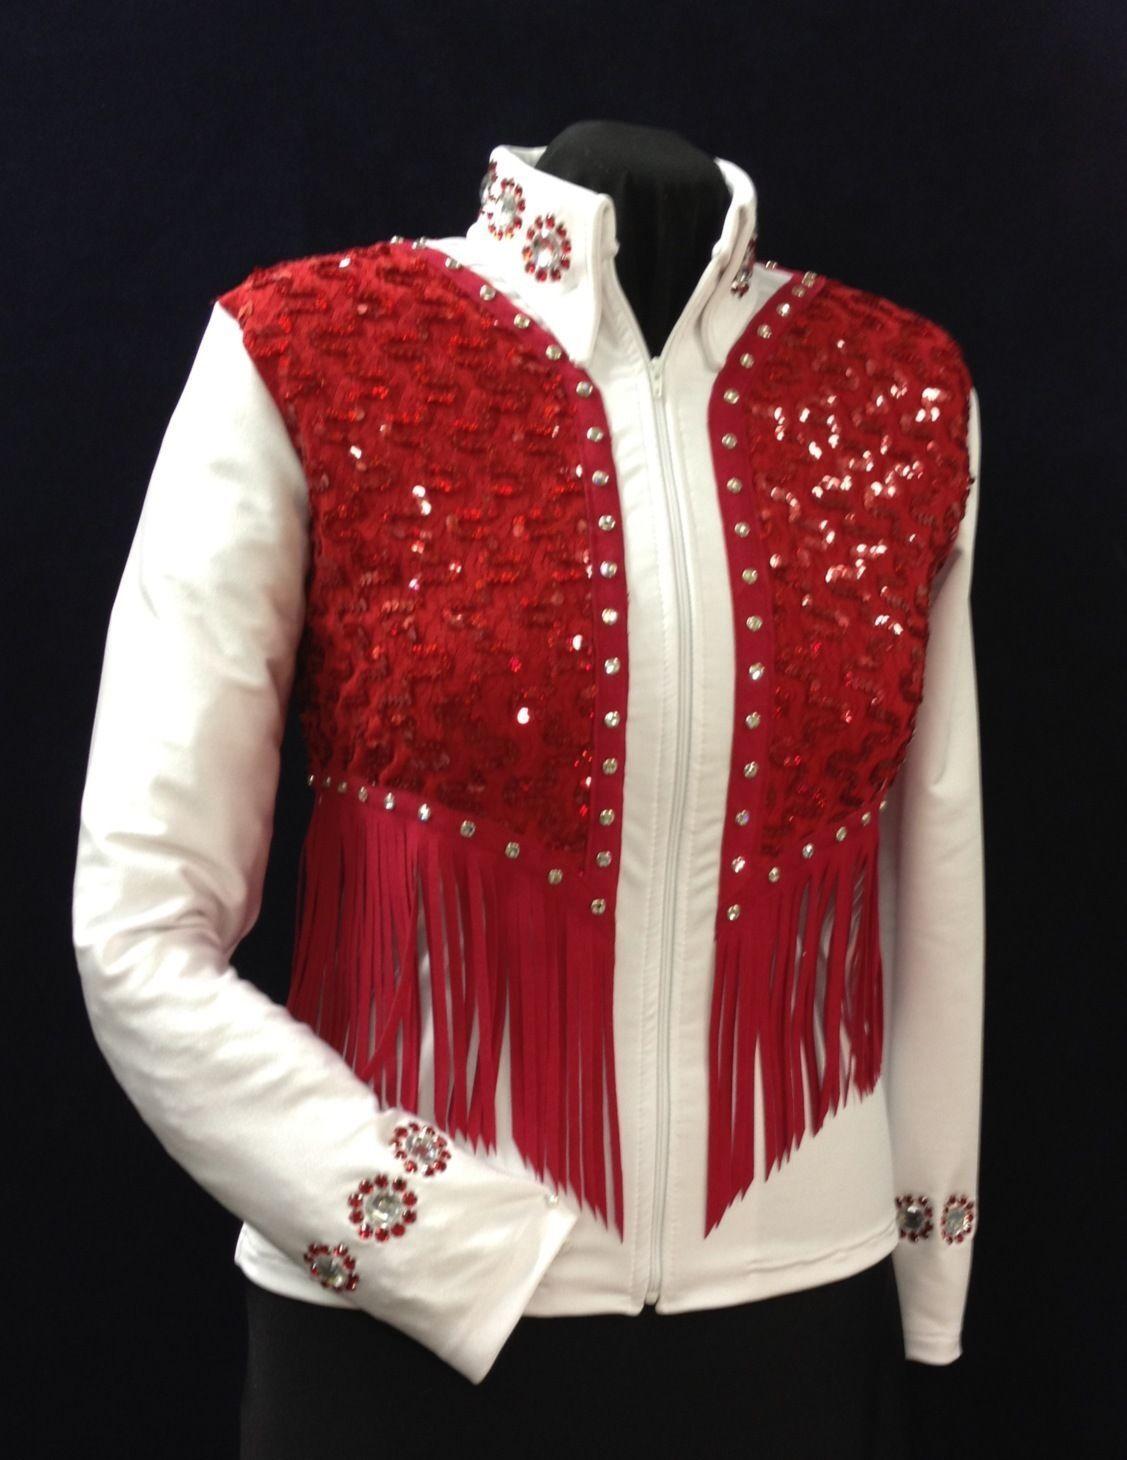 Western show spectacle Horsehomengrenerip shirt adulte par RIDING HIGH USA